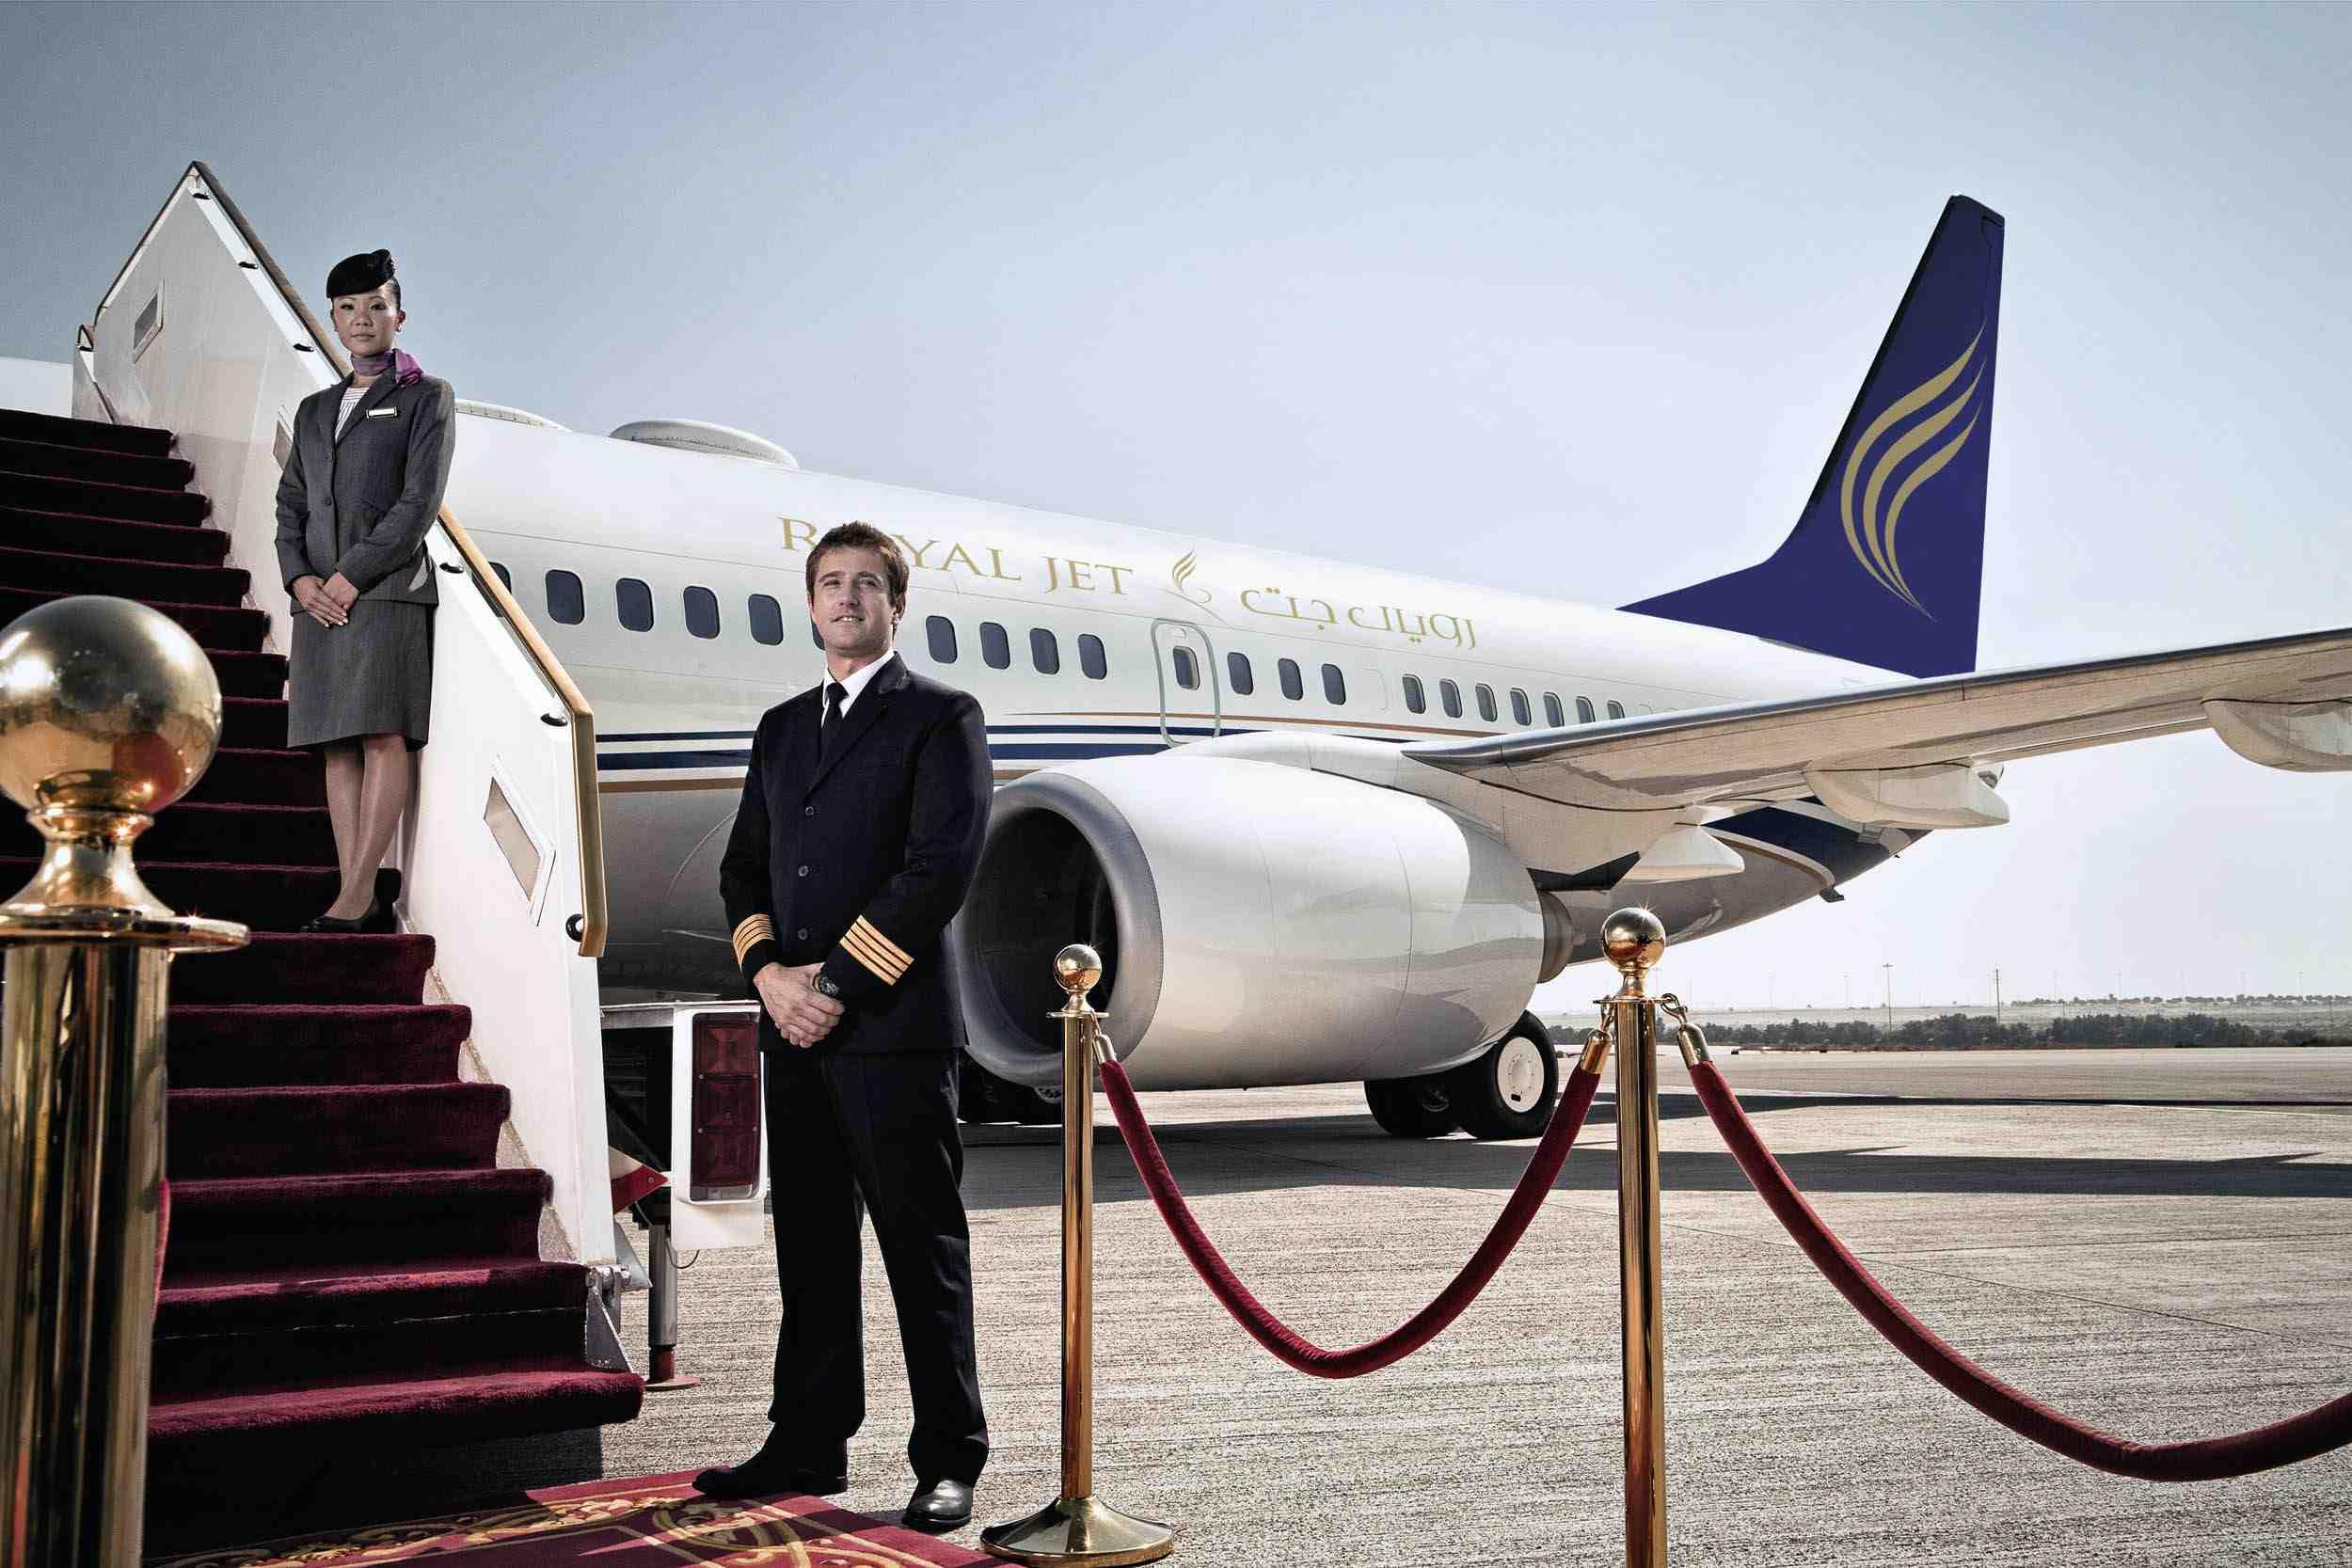 Take A Private Jet | pustcha.com